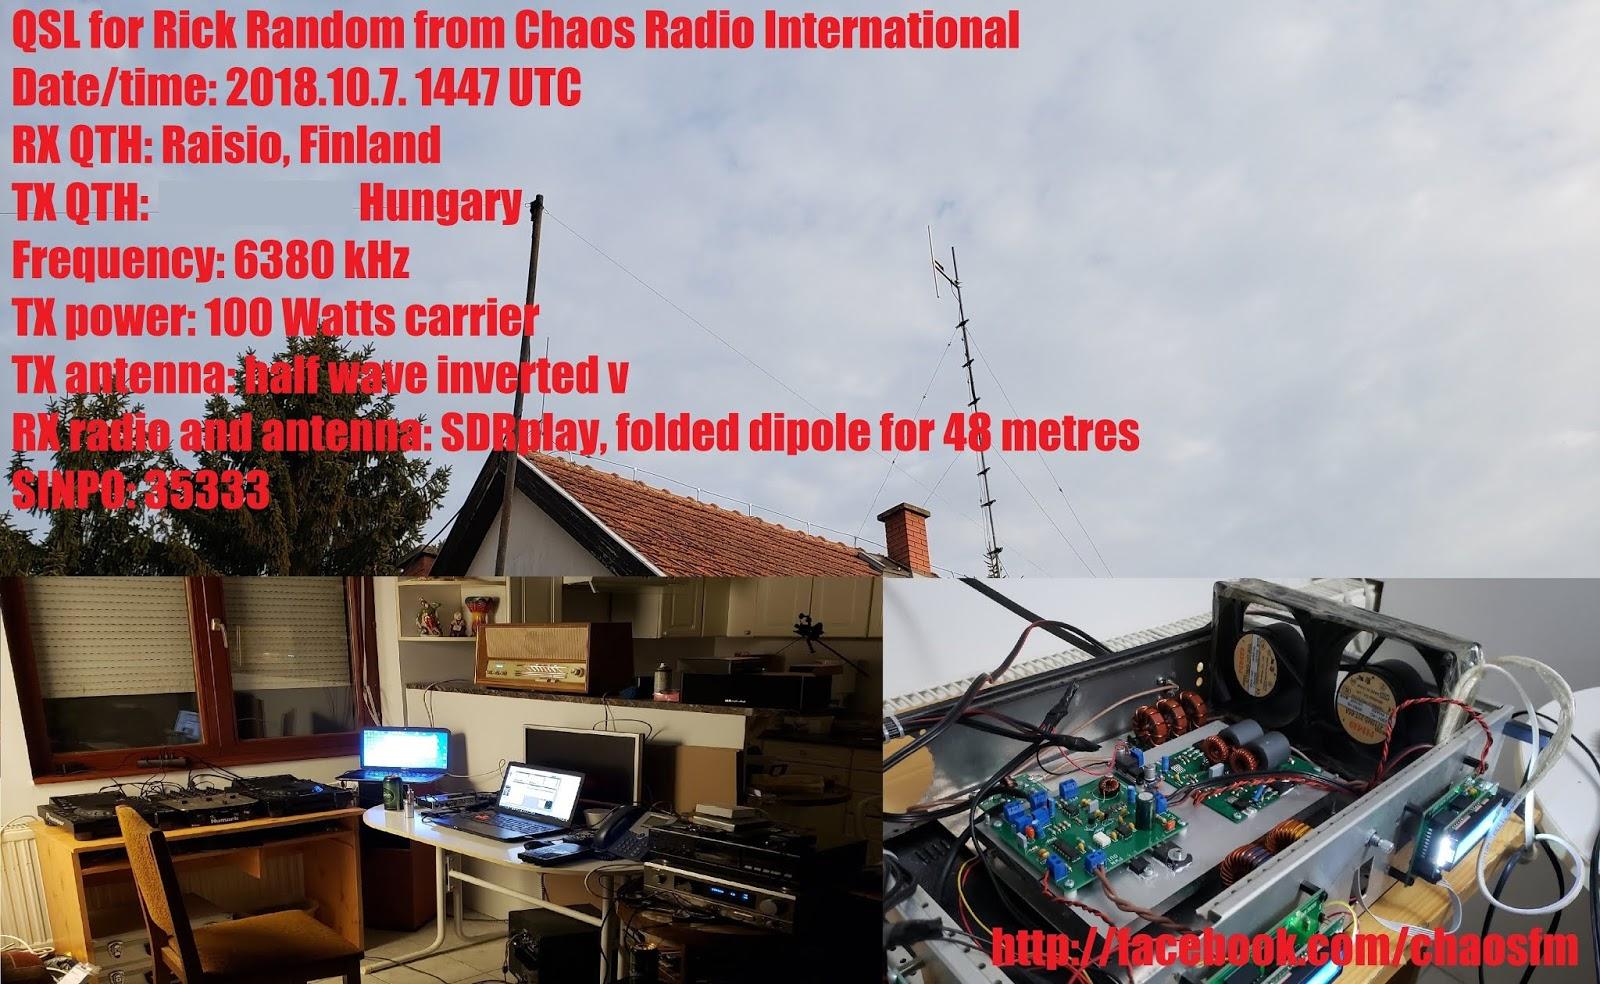 Rick's pirate radio blog - etc